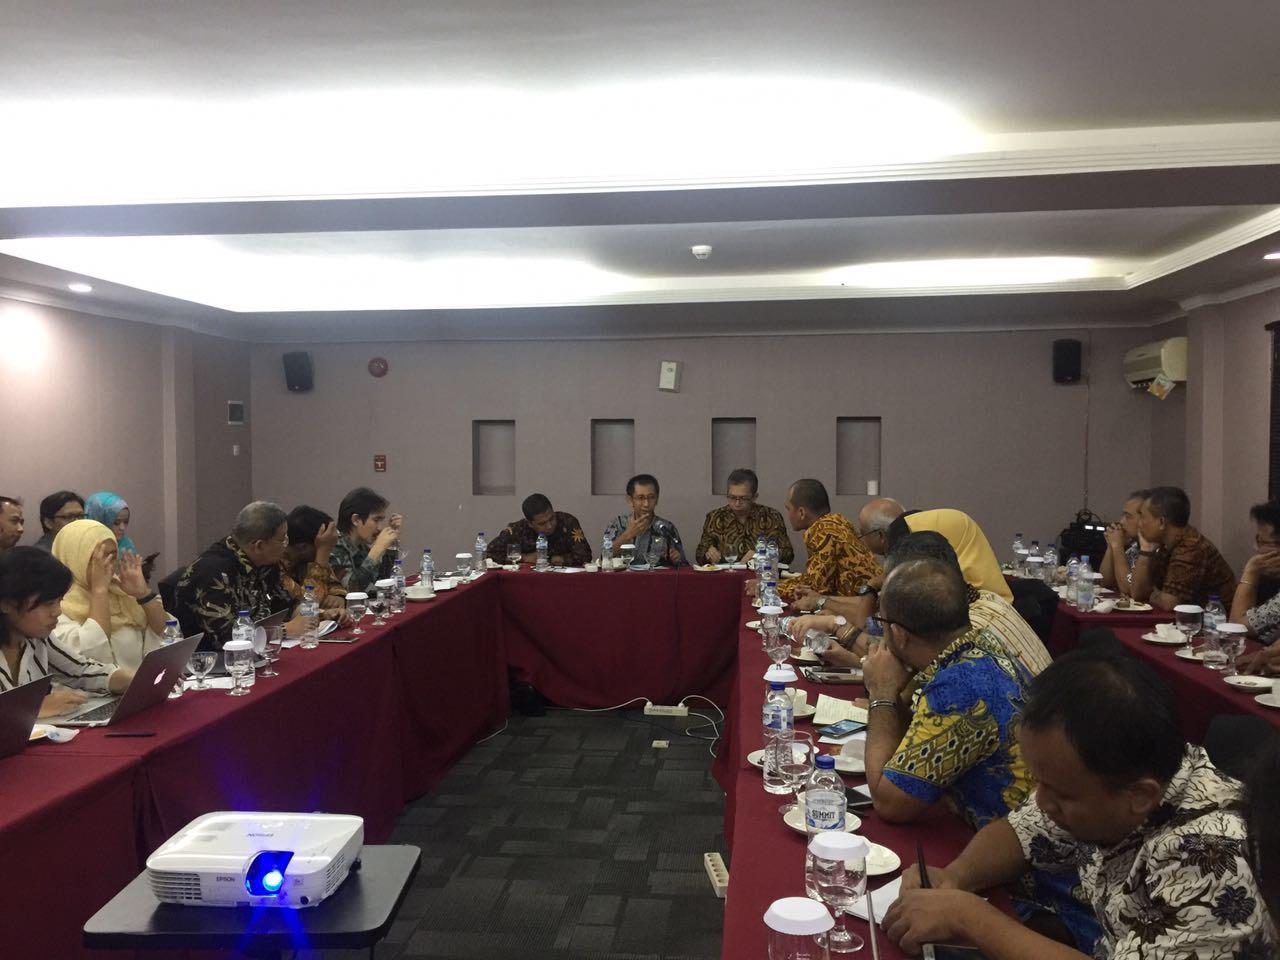 Diskusi dengan Direktorat Jenderal Tata Ruang, Kementerian Agraria dan Tata Ruang